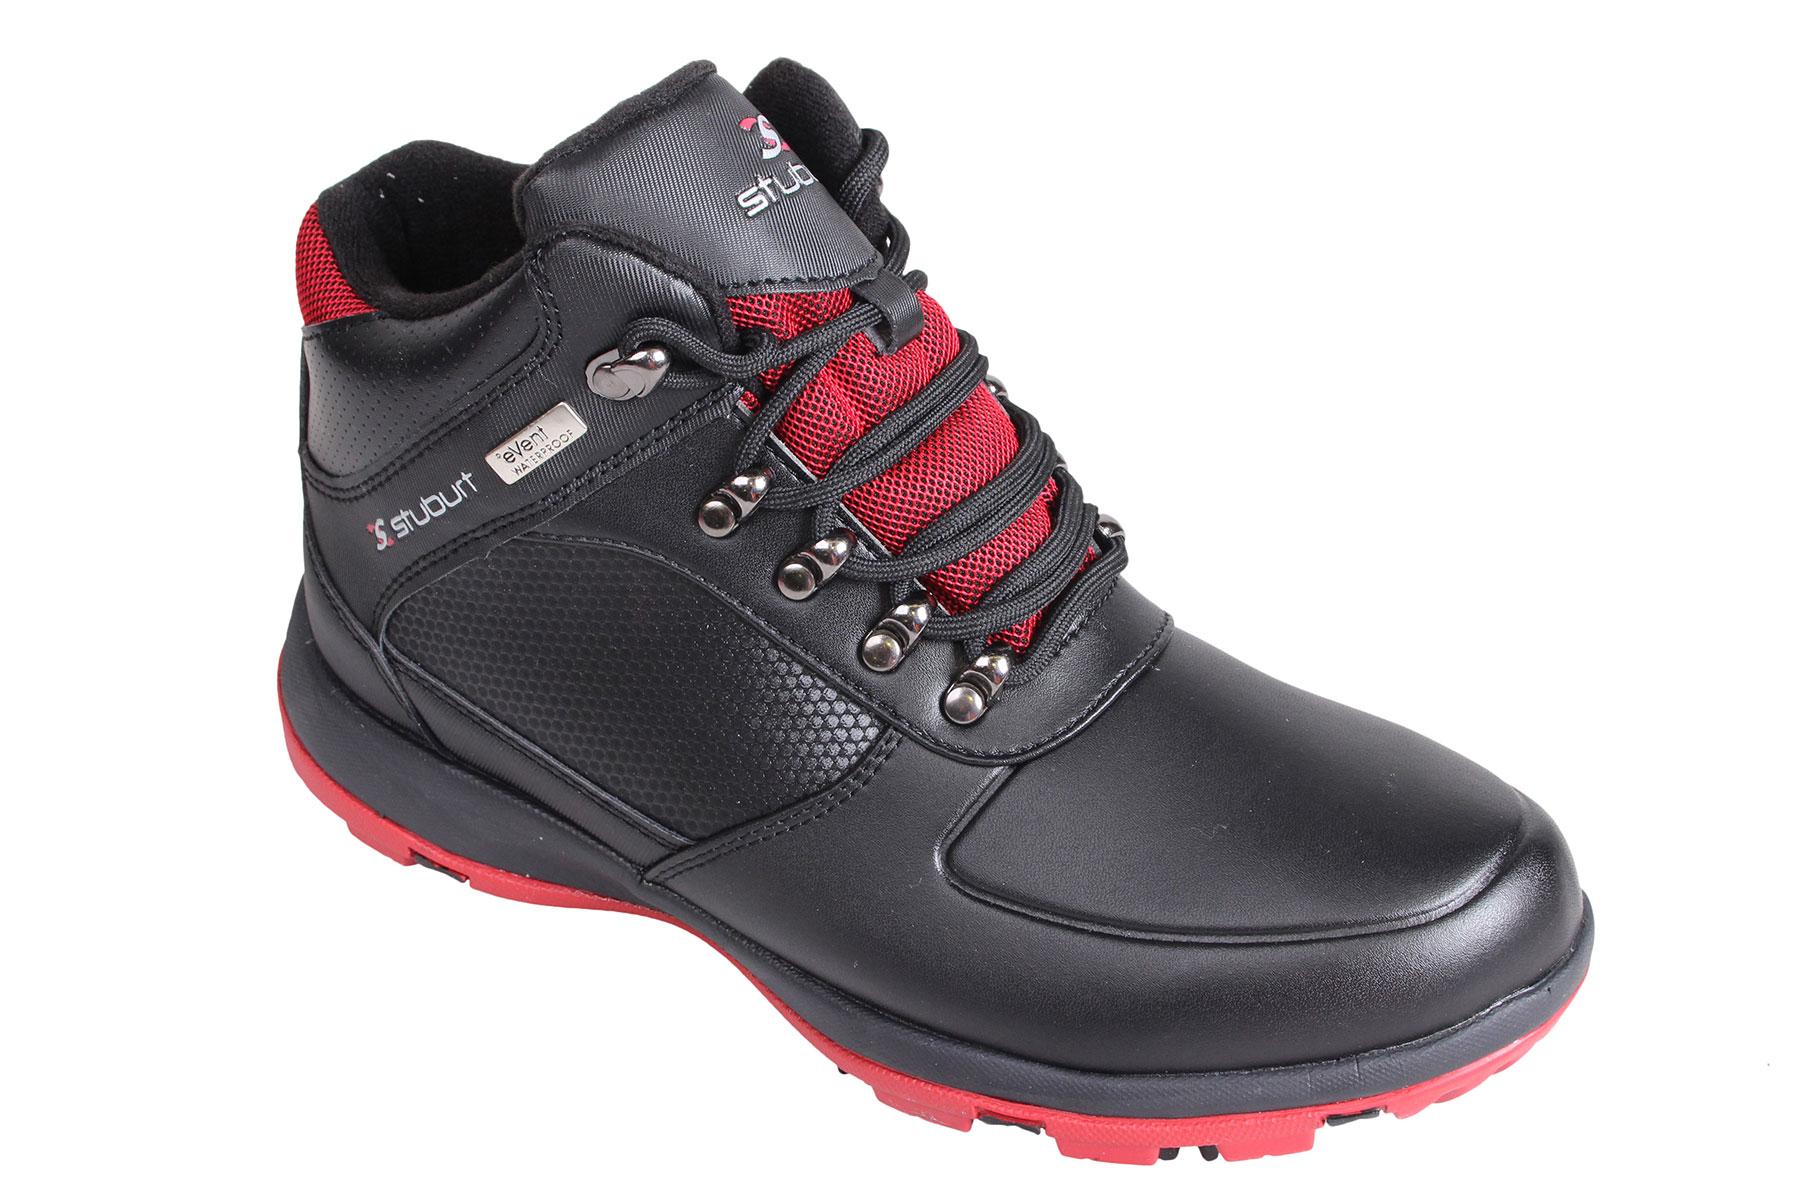 Callaway Golf Winter Shoes